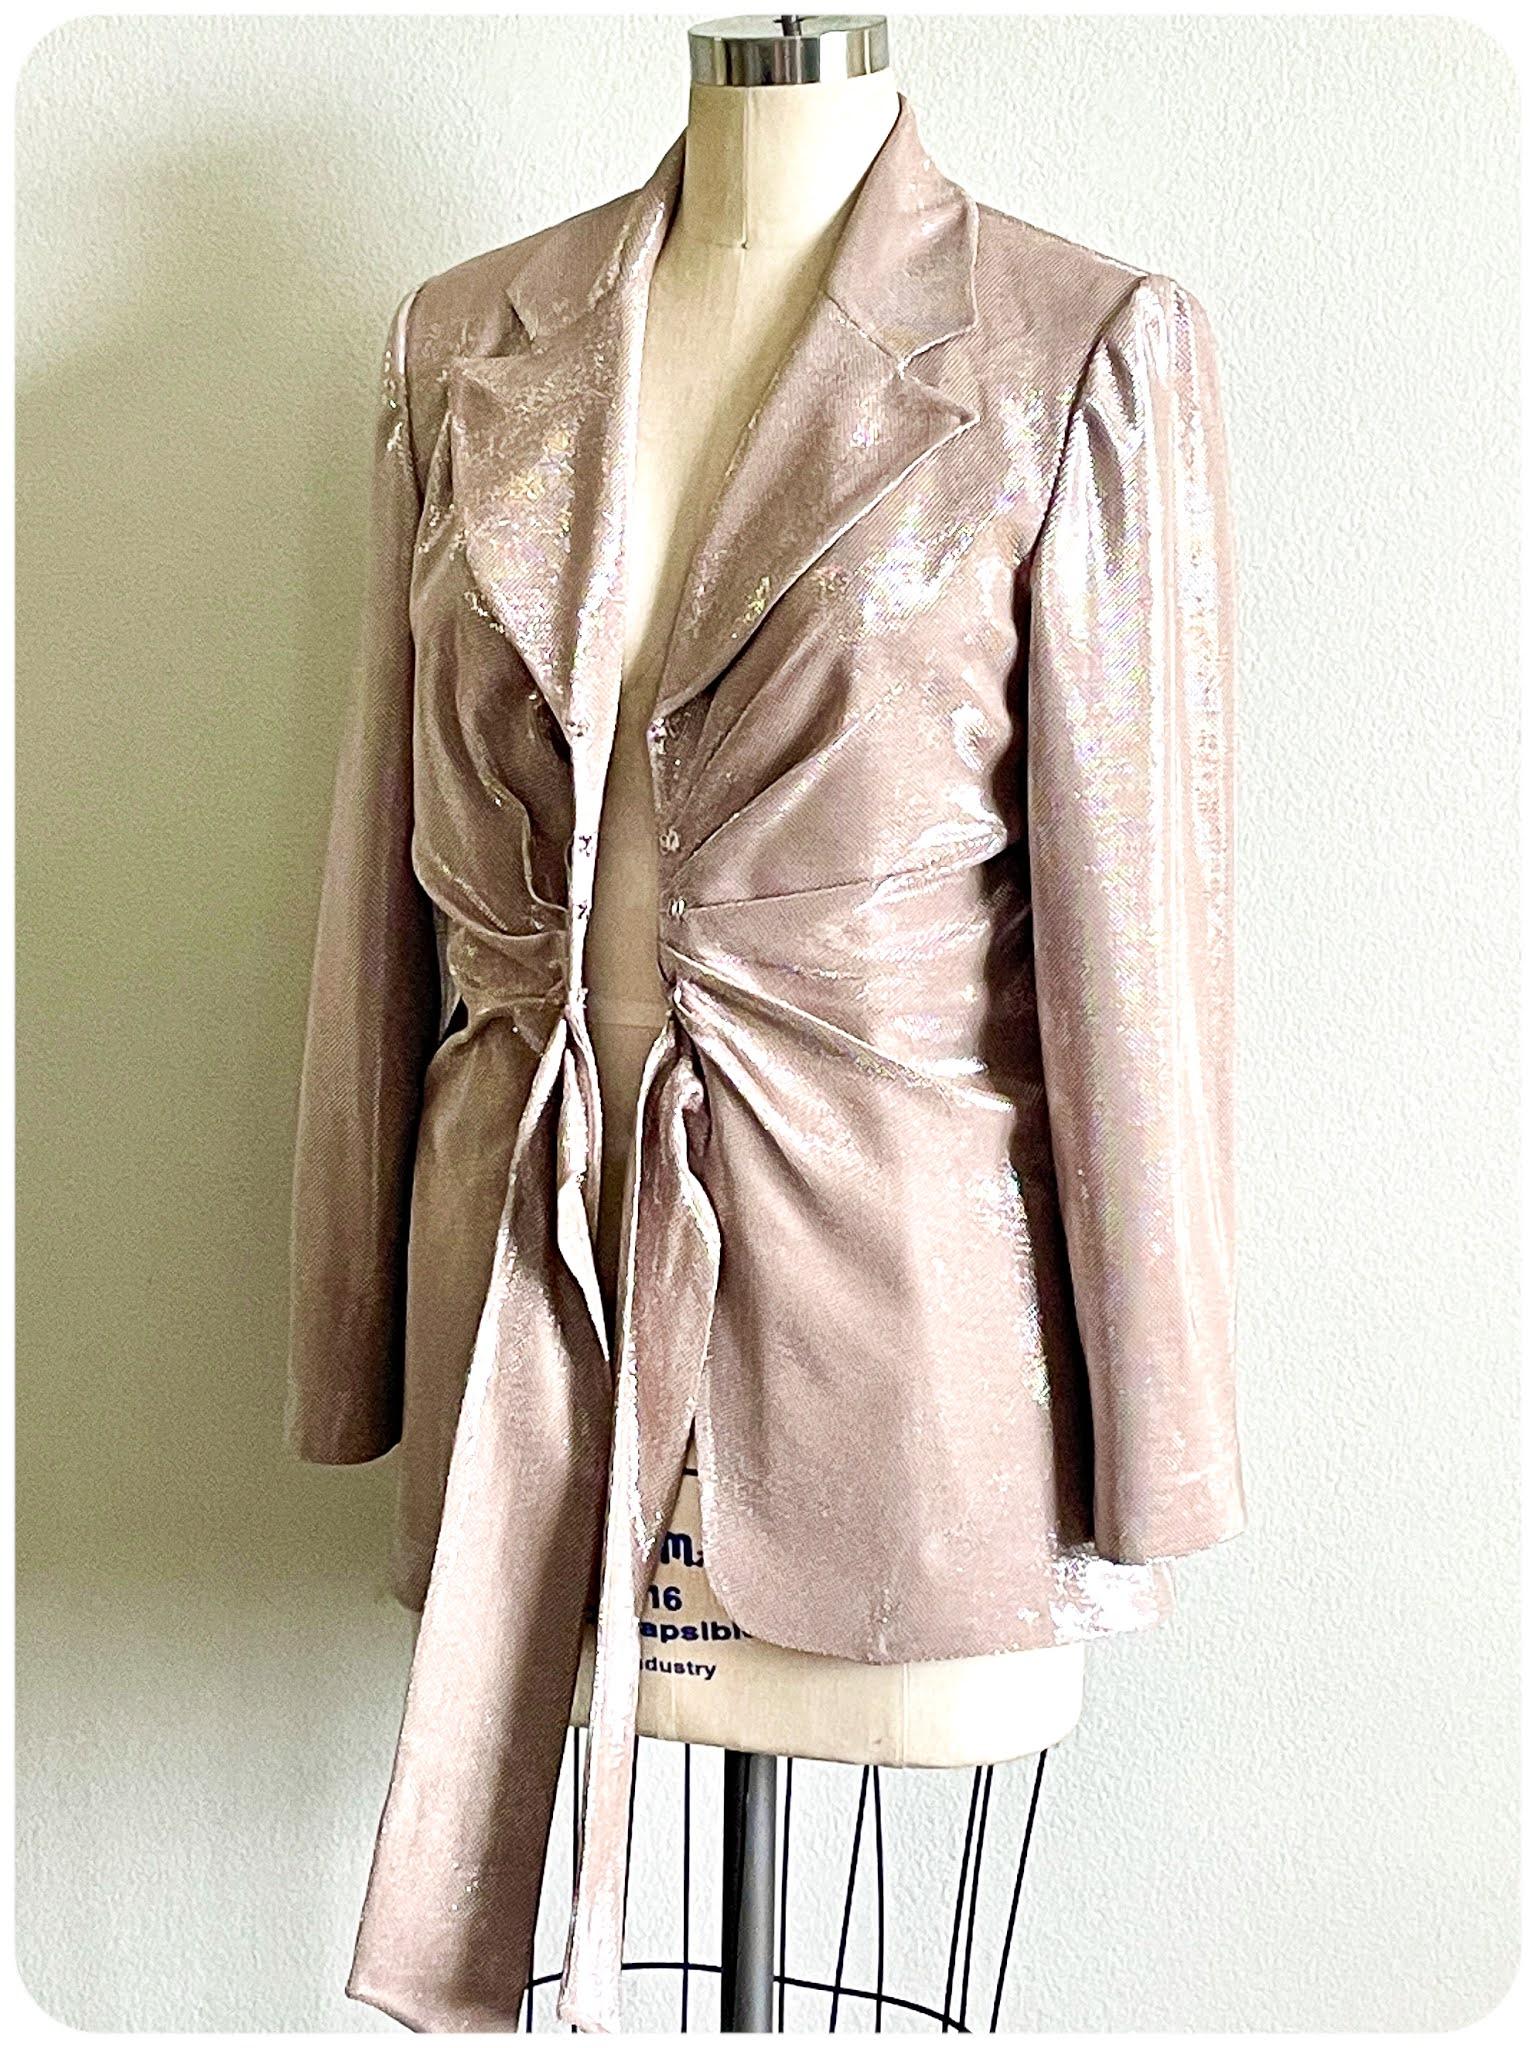 Lurex Suit - Erica Bunker DIY Style x Zelouf Fabrics